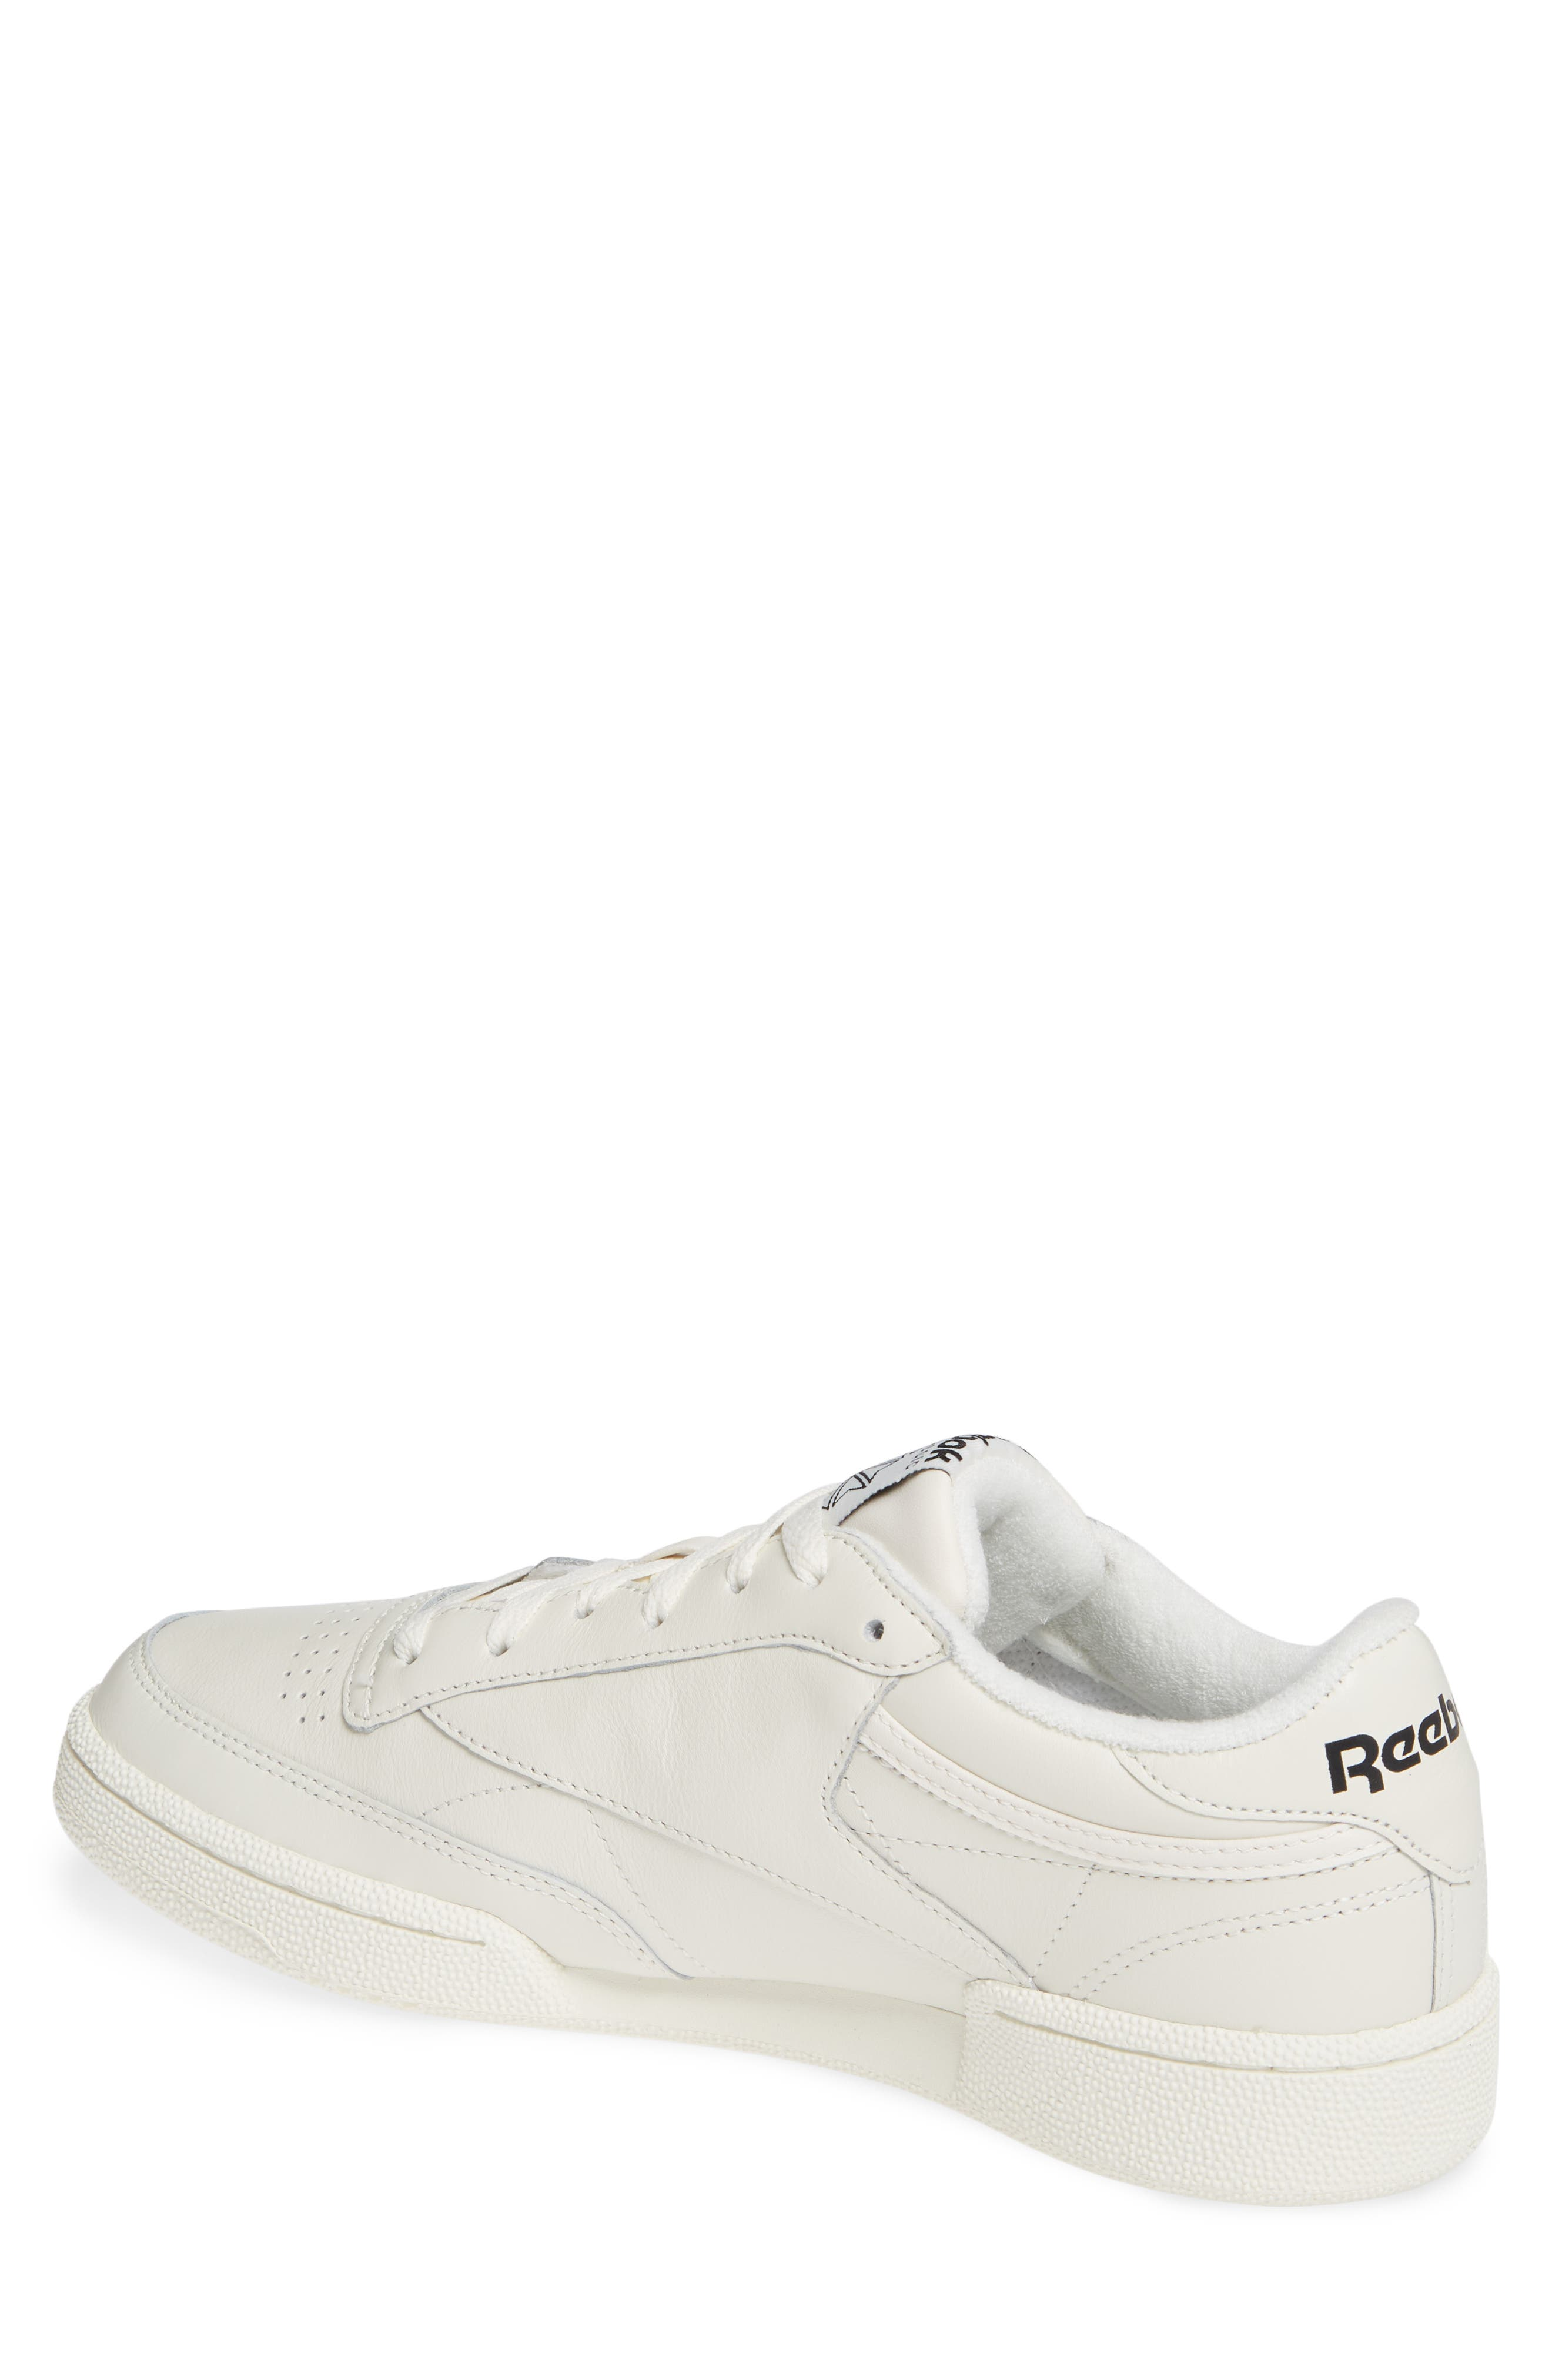 Vintage Club C 85 MU Sneaker,                             Alternate thumbnail 2, color,                             CHALK/ BLACK